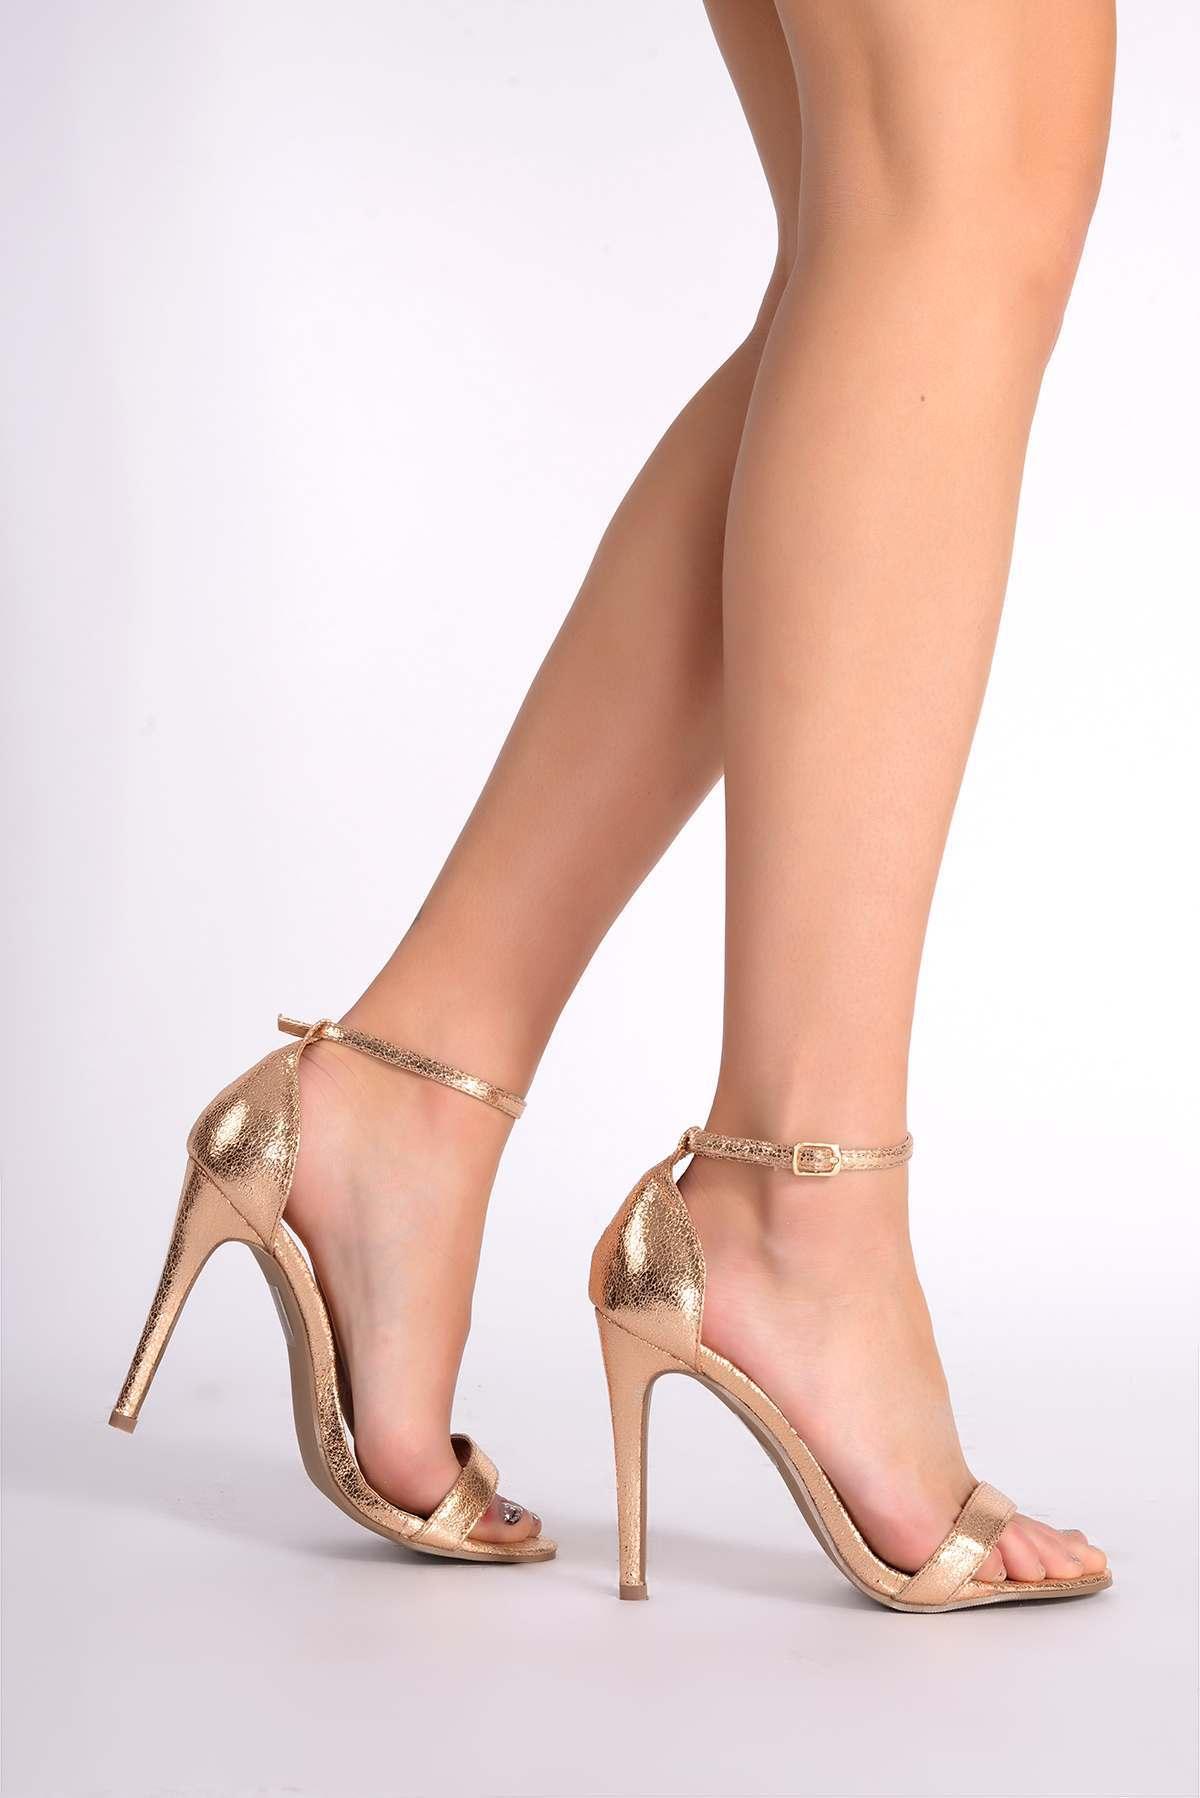 10f940b6c3fa marney rose gold ankle strap heels available via PricePi.com. Shop ...